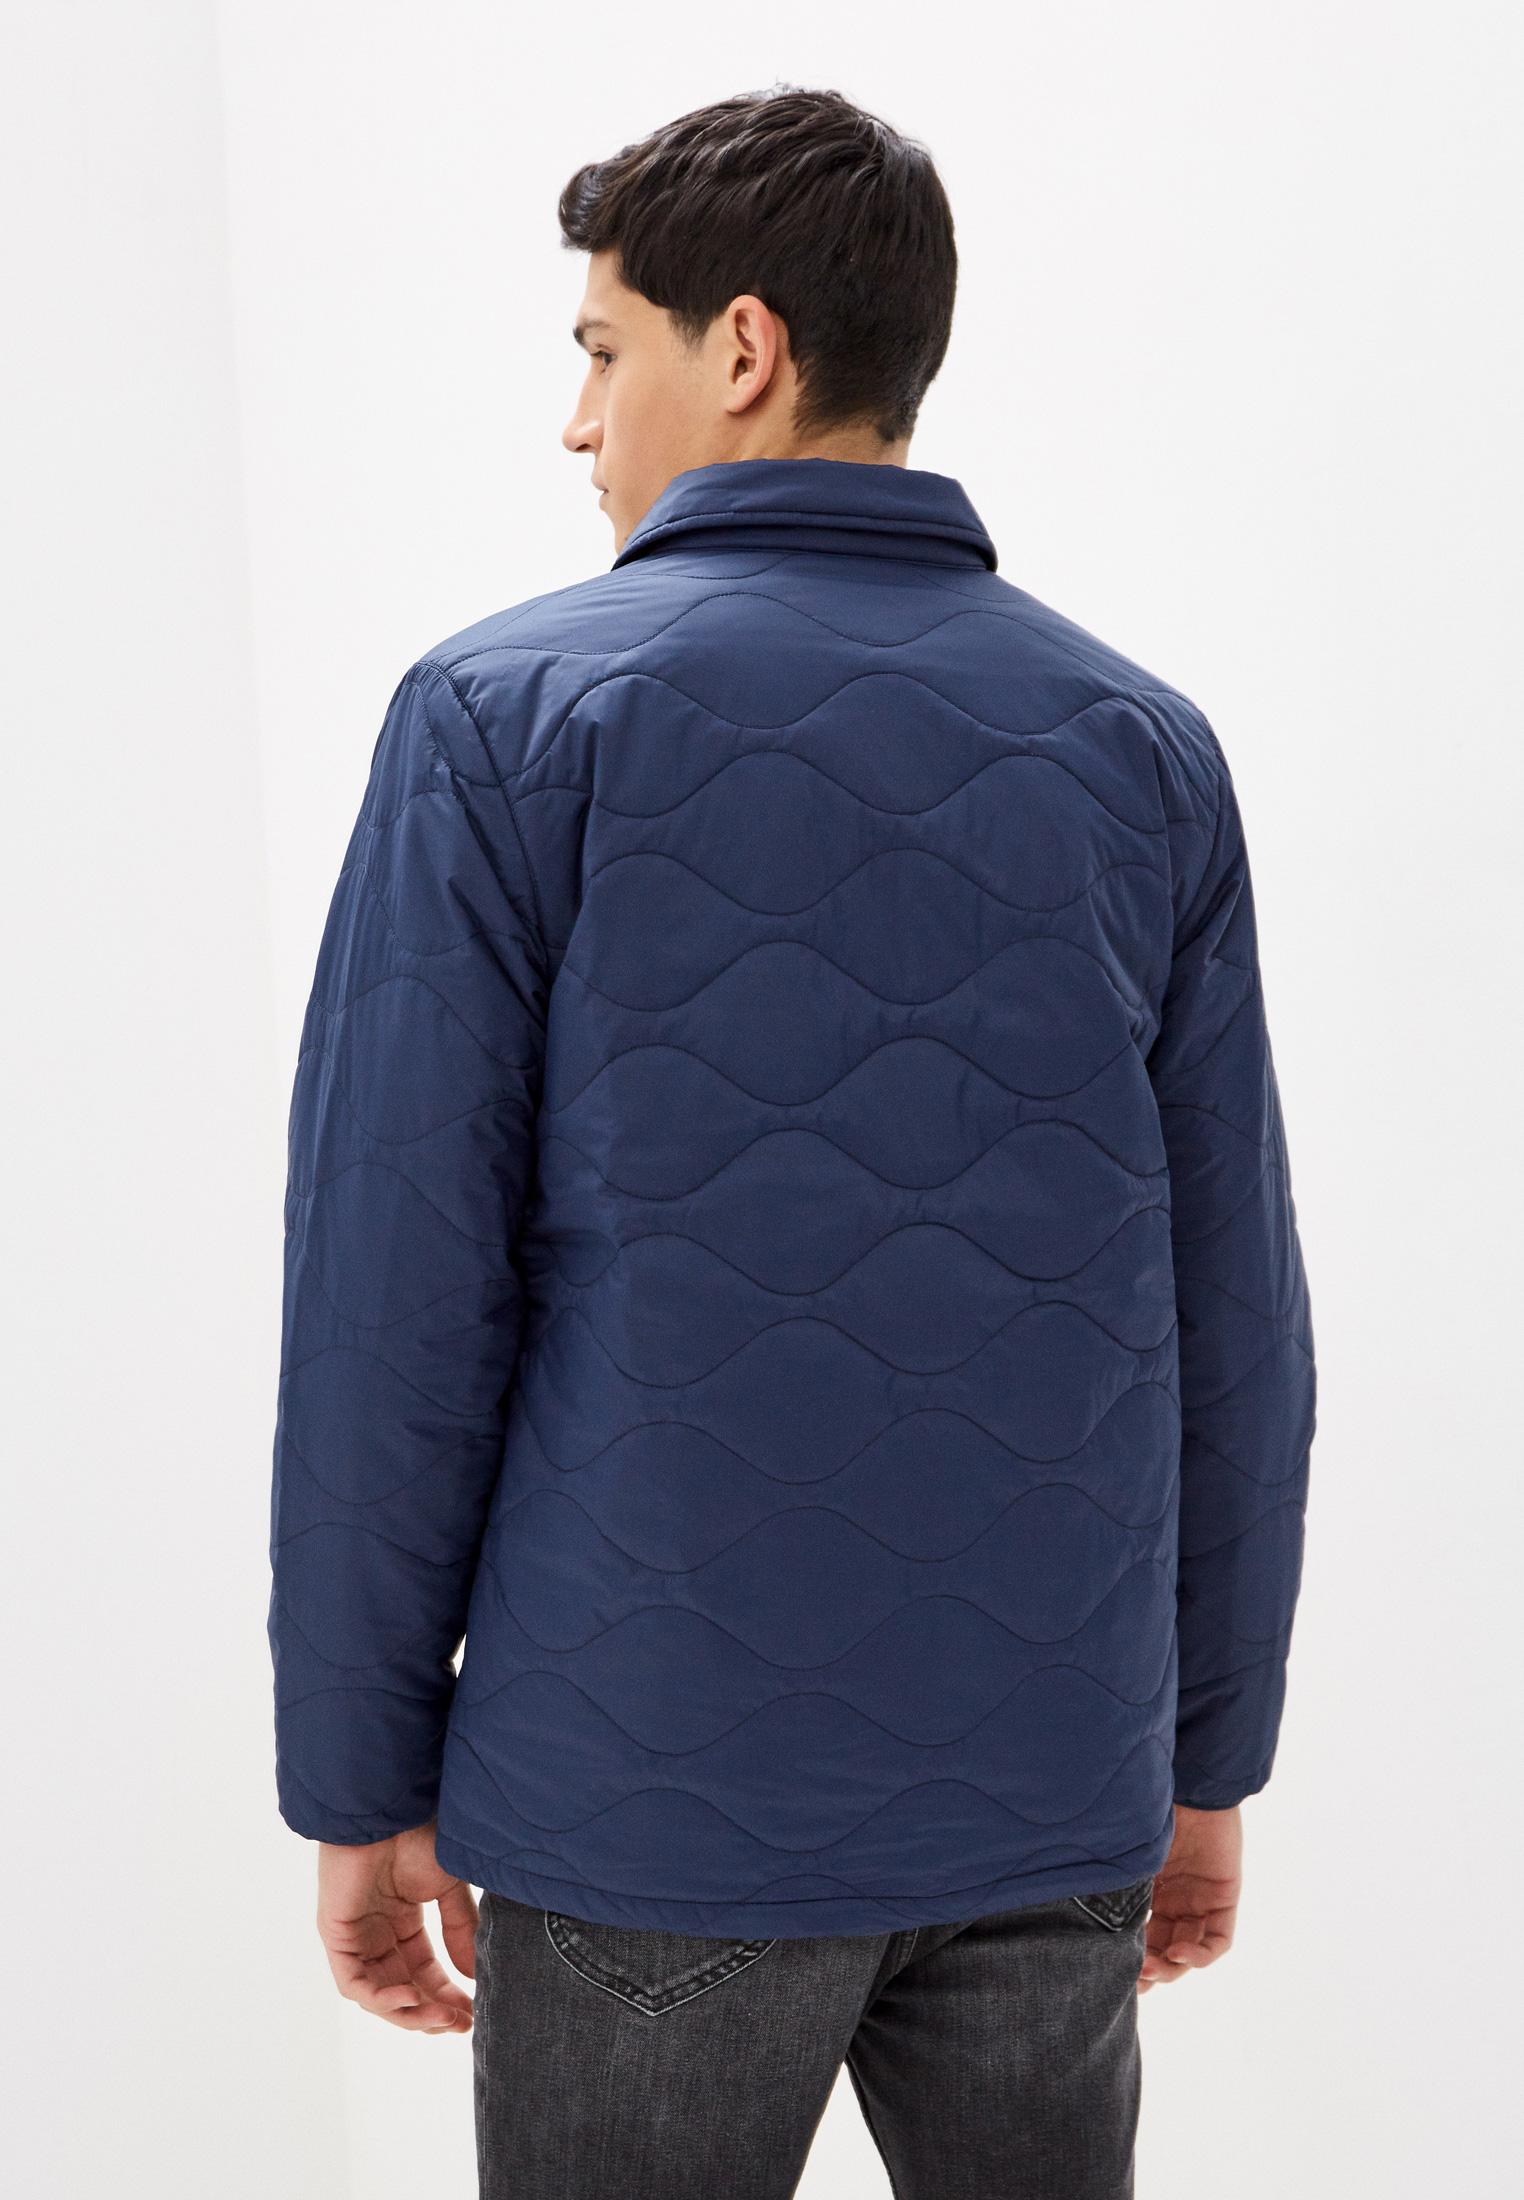 Куртка VANS VA457OLKZ: изображение 3